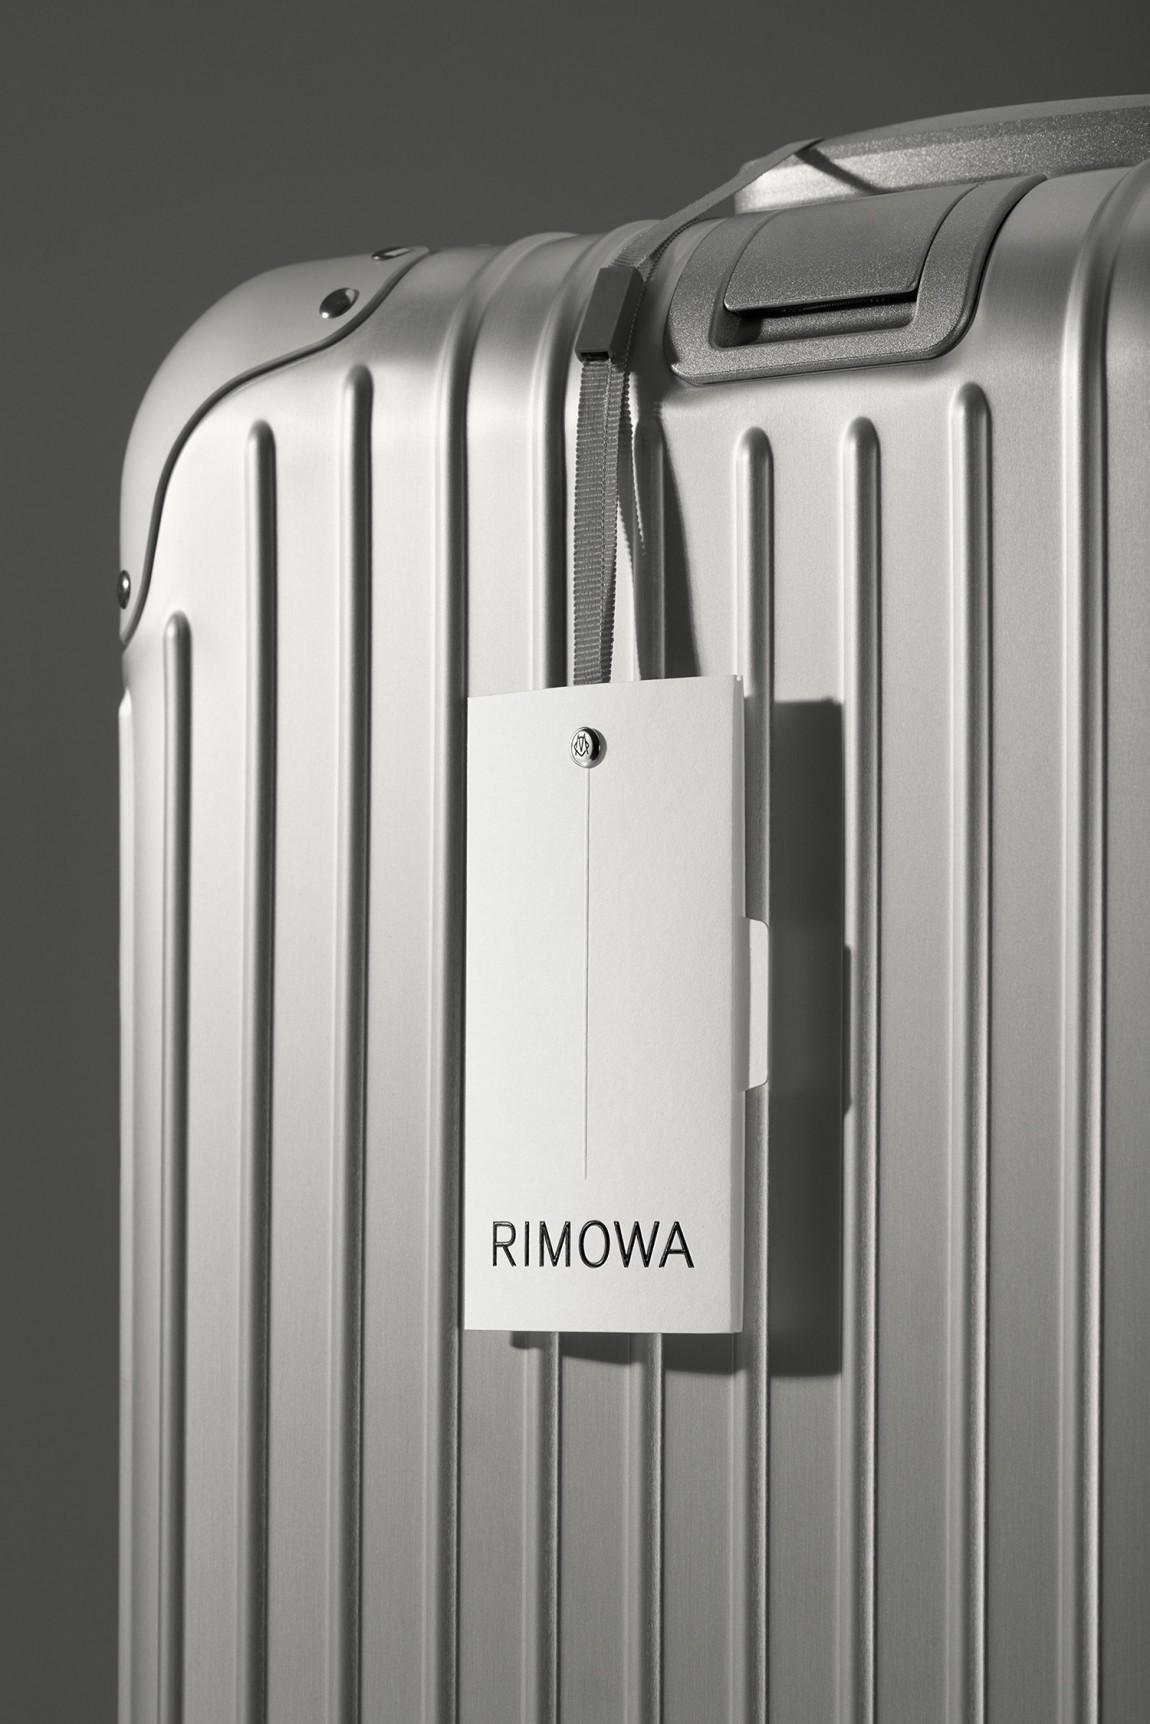 Rimowa豪华箱包国际品牌VI设计, 吊牌设计